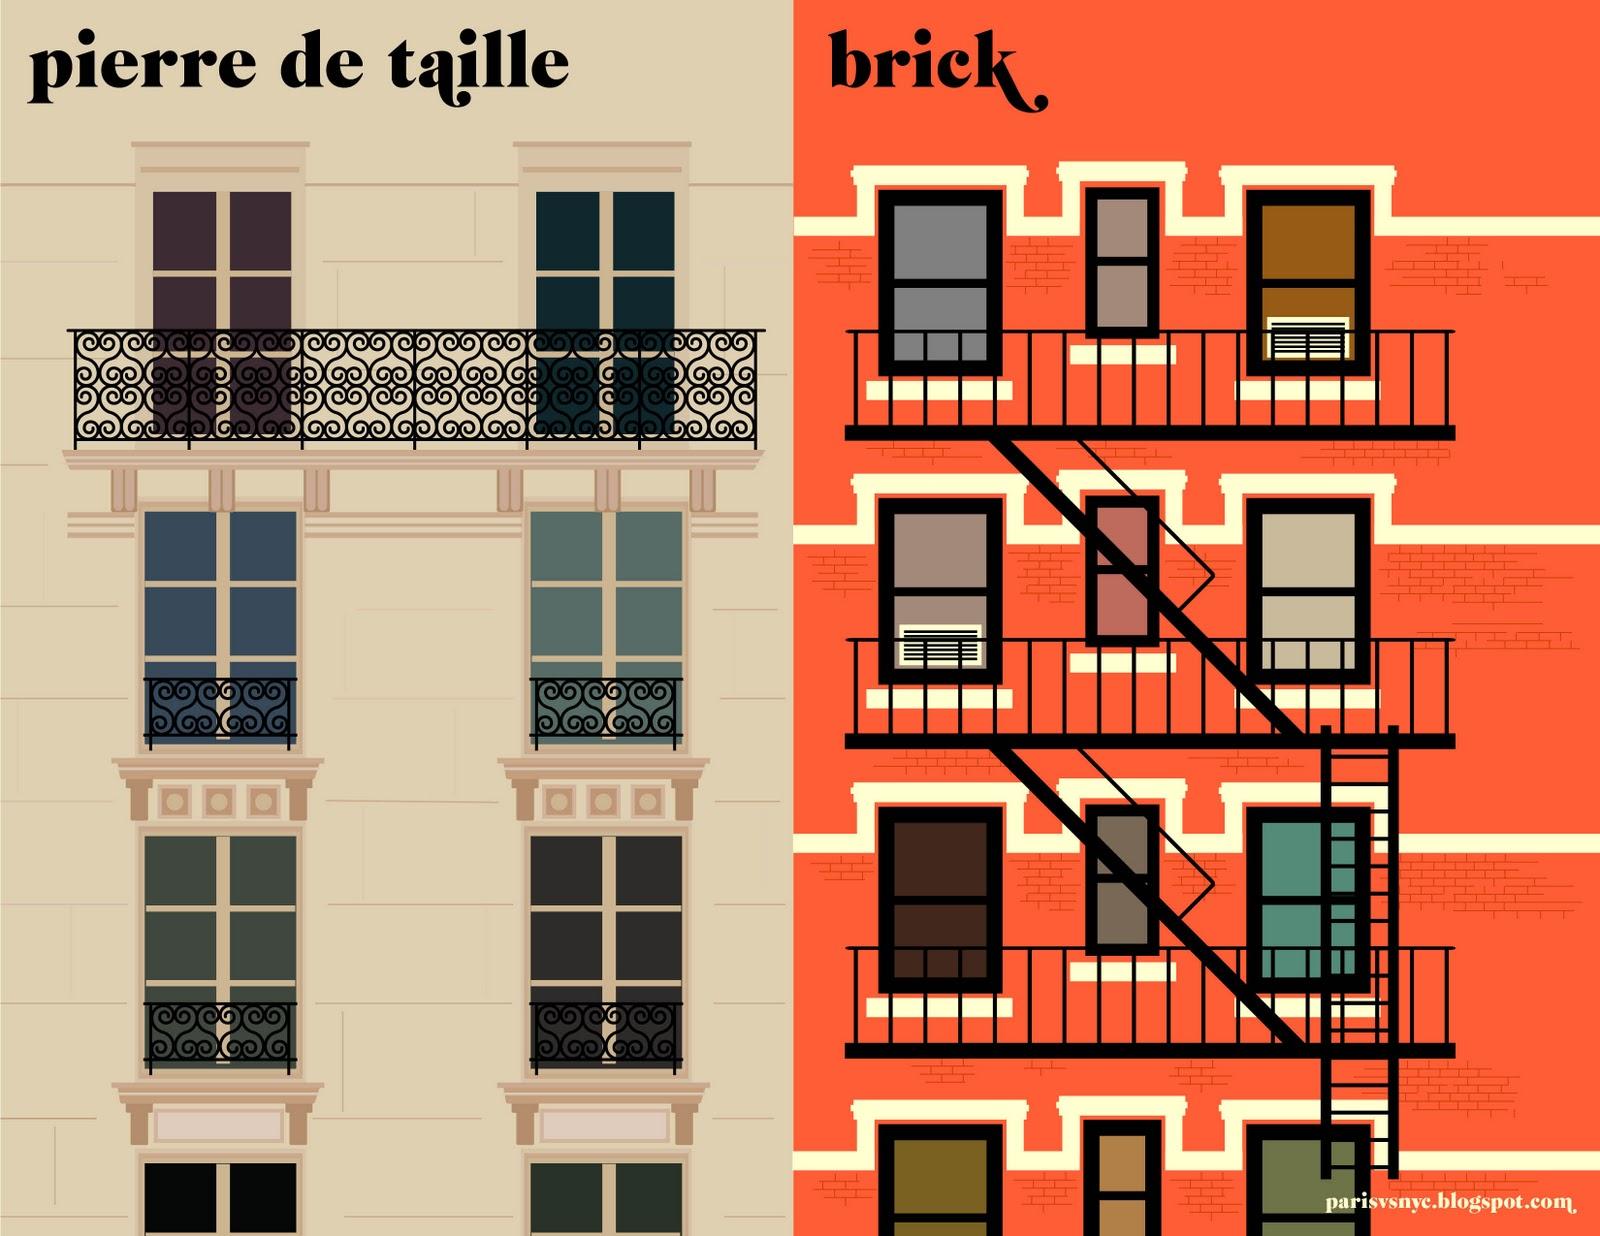 Pierre de Taille vs Brick